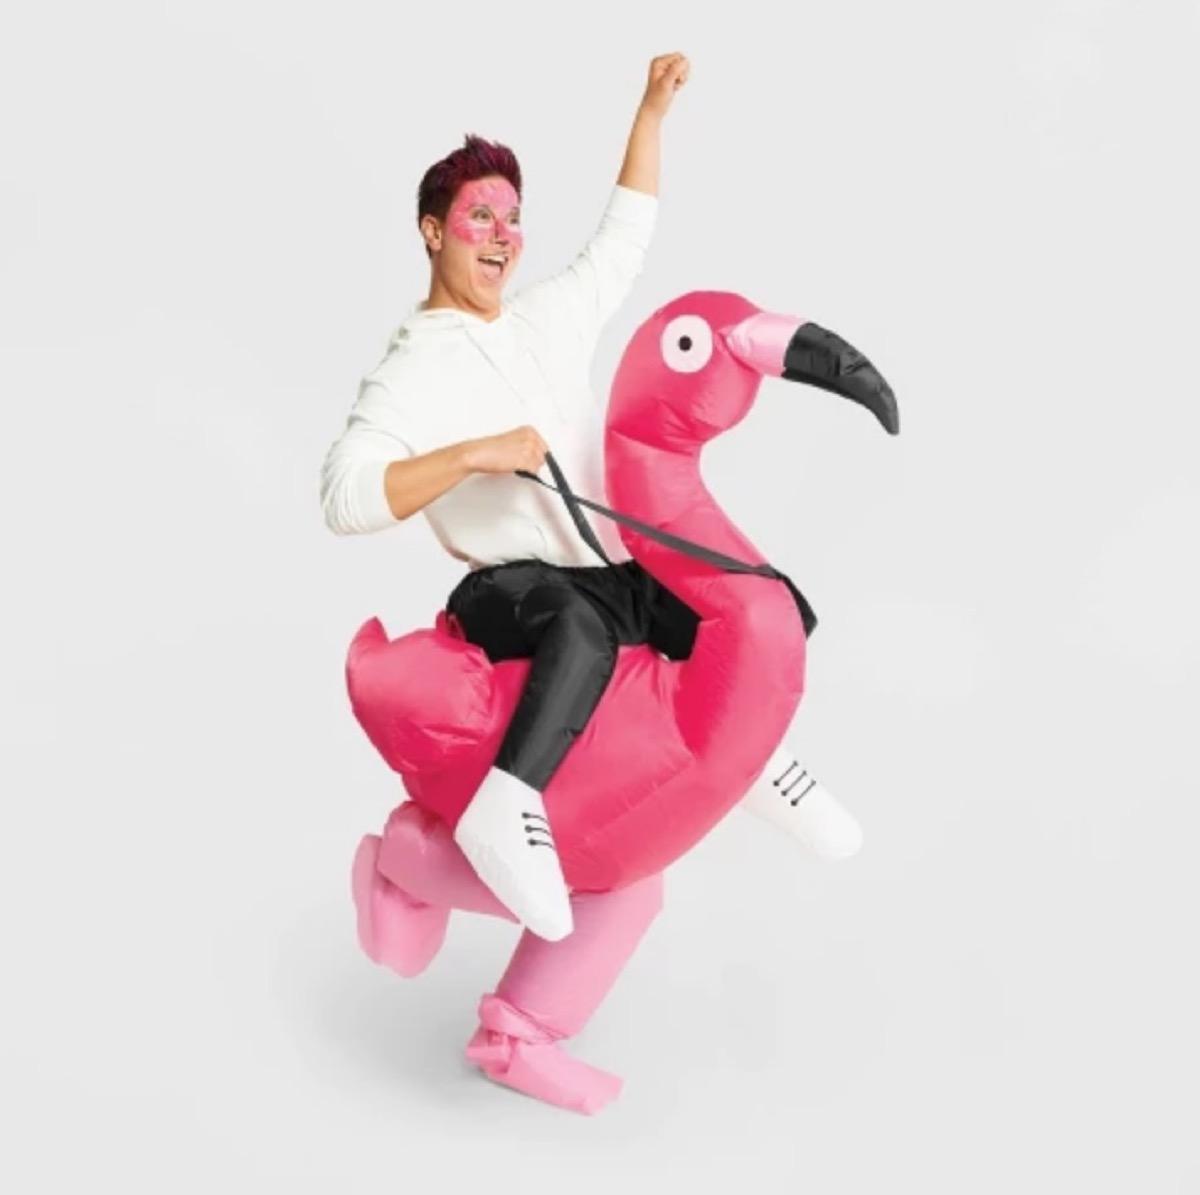 flamingo rider costume, best halloween costumes